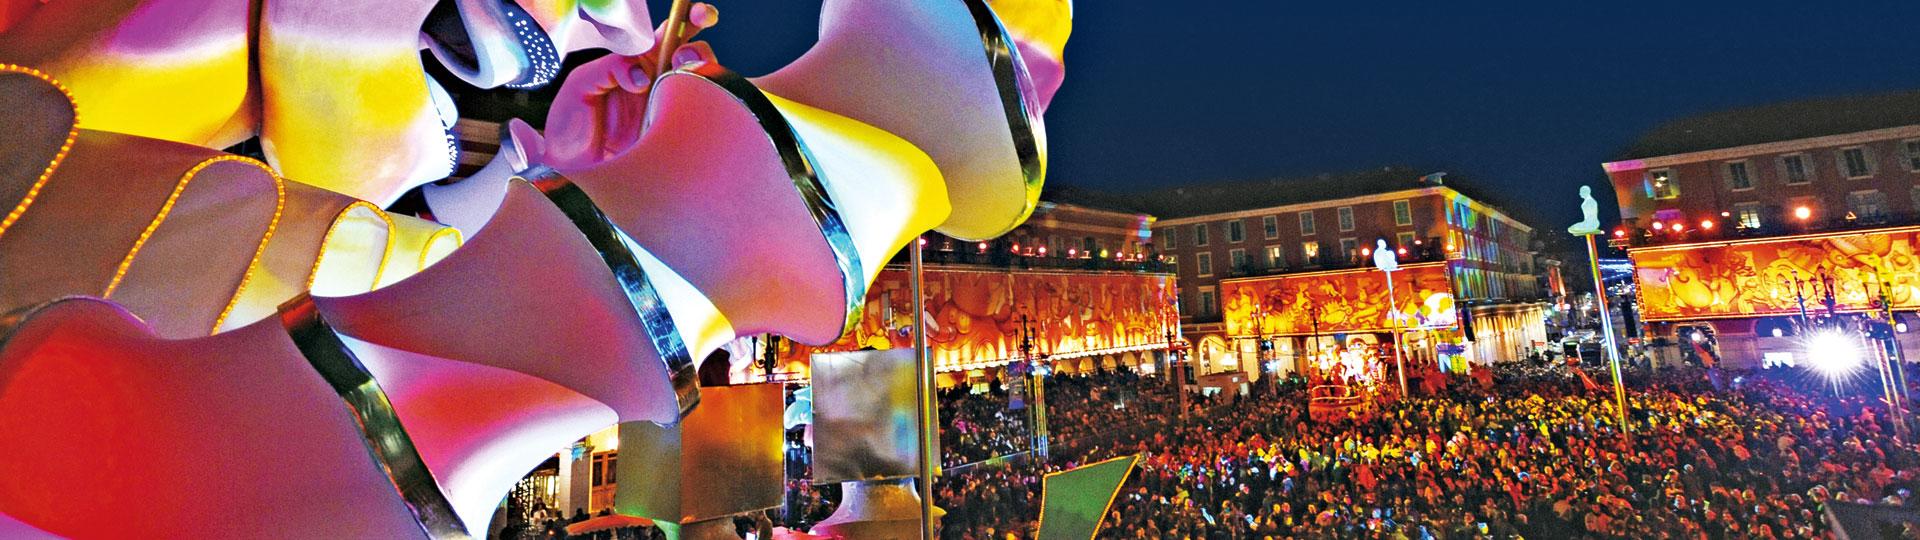 Carnaval de Nice en soirée